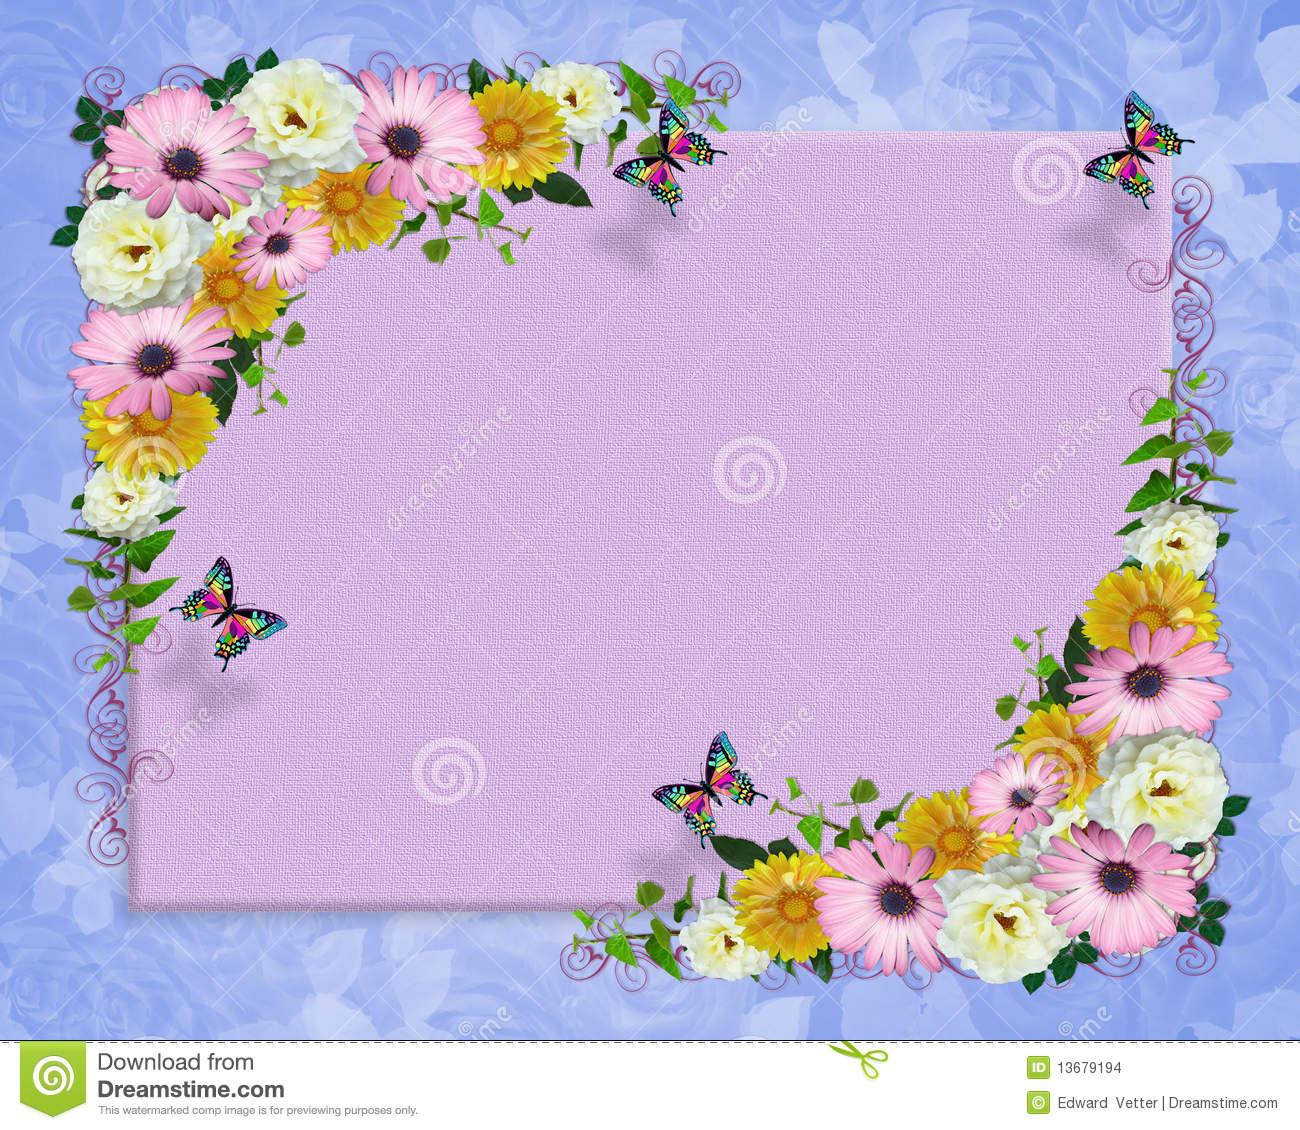 wallpapercomphotopurple butterfly wallpaper border40html 1300x1130